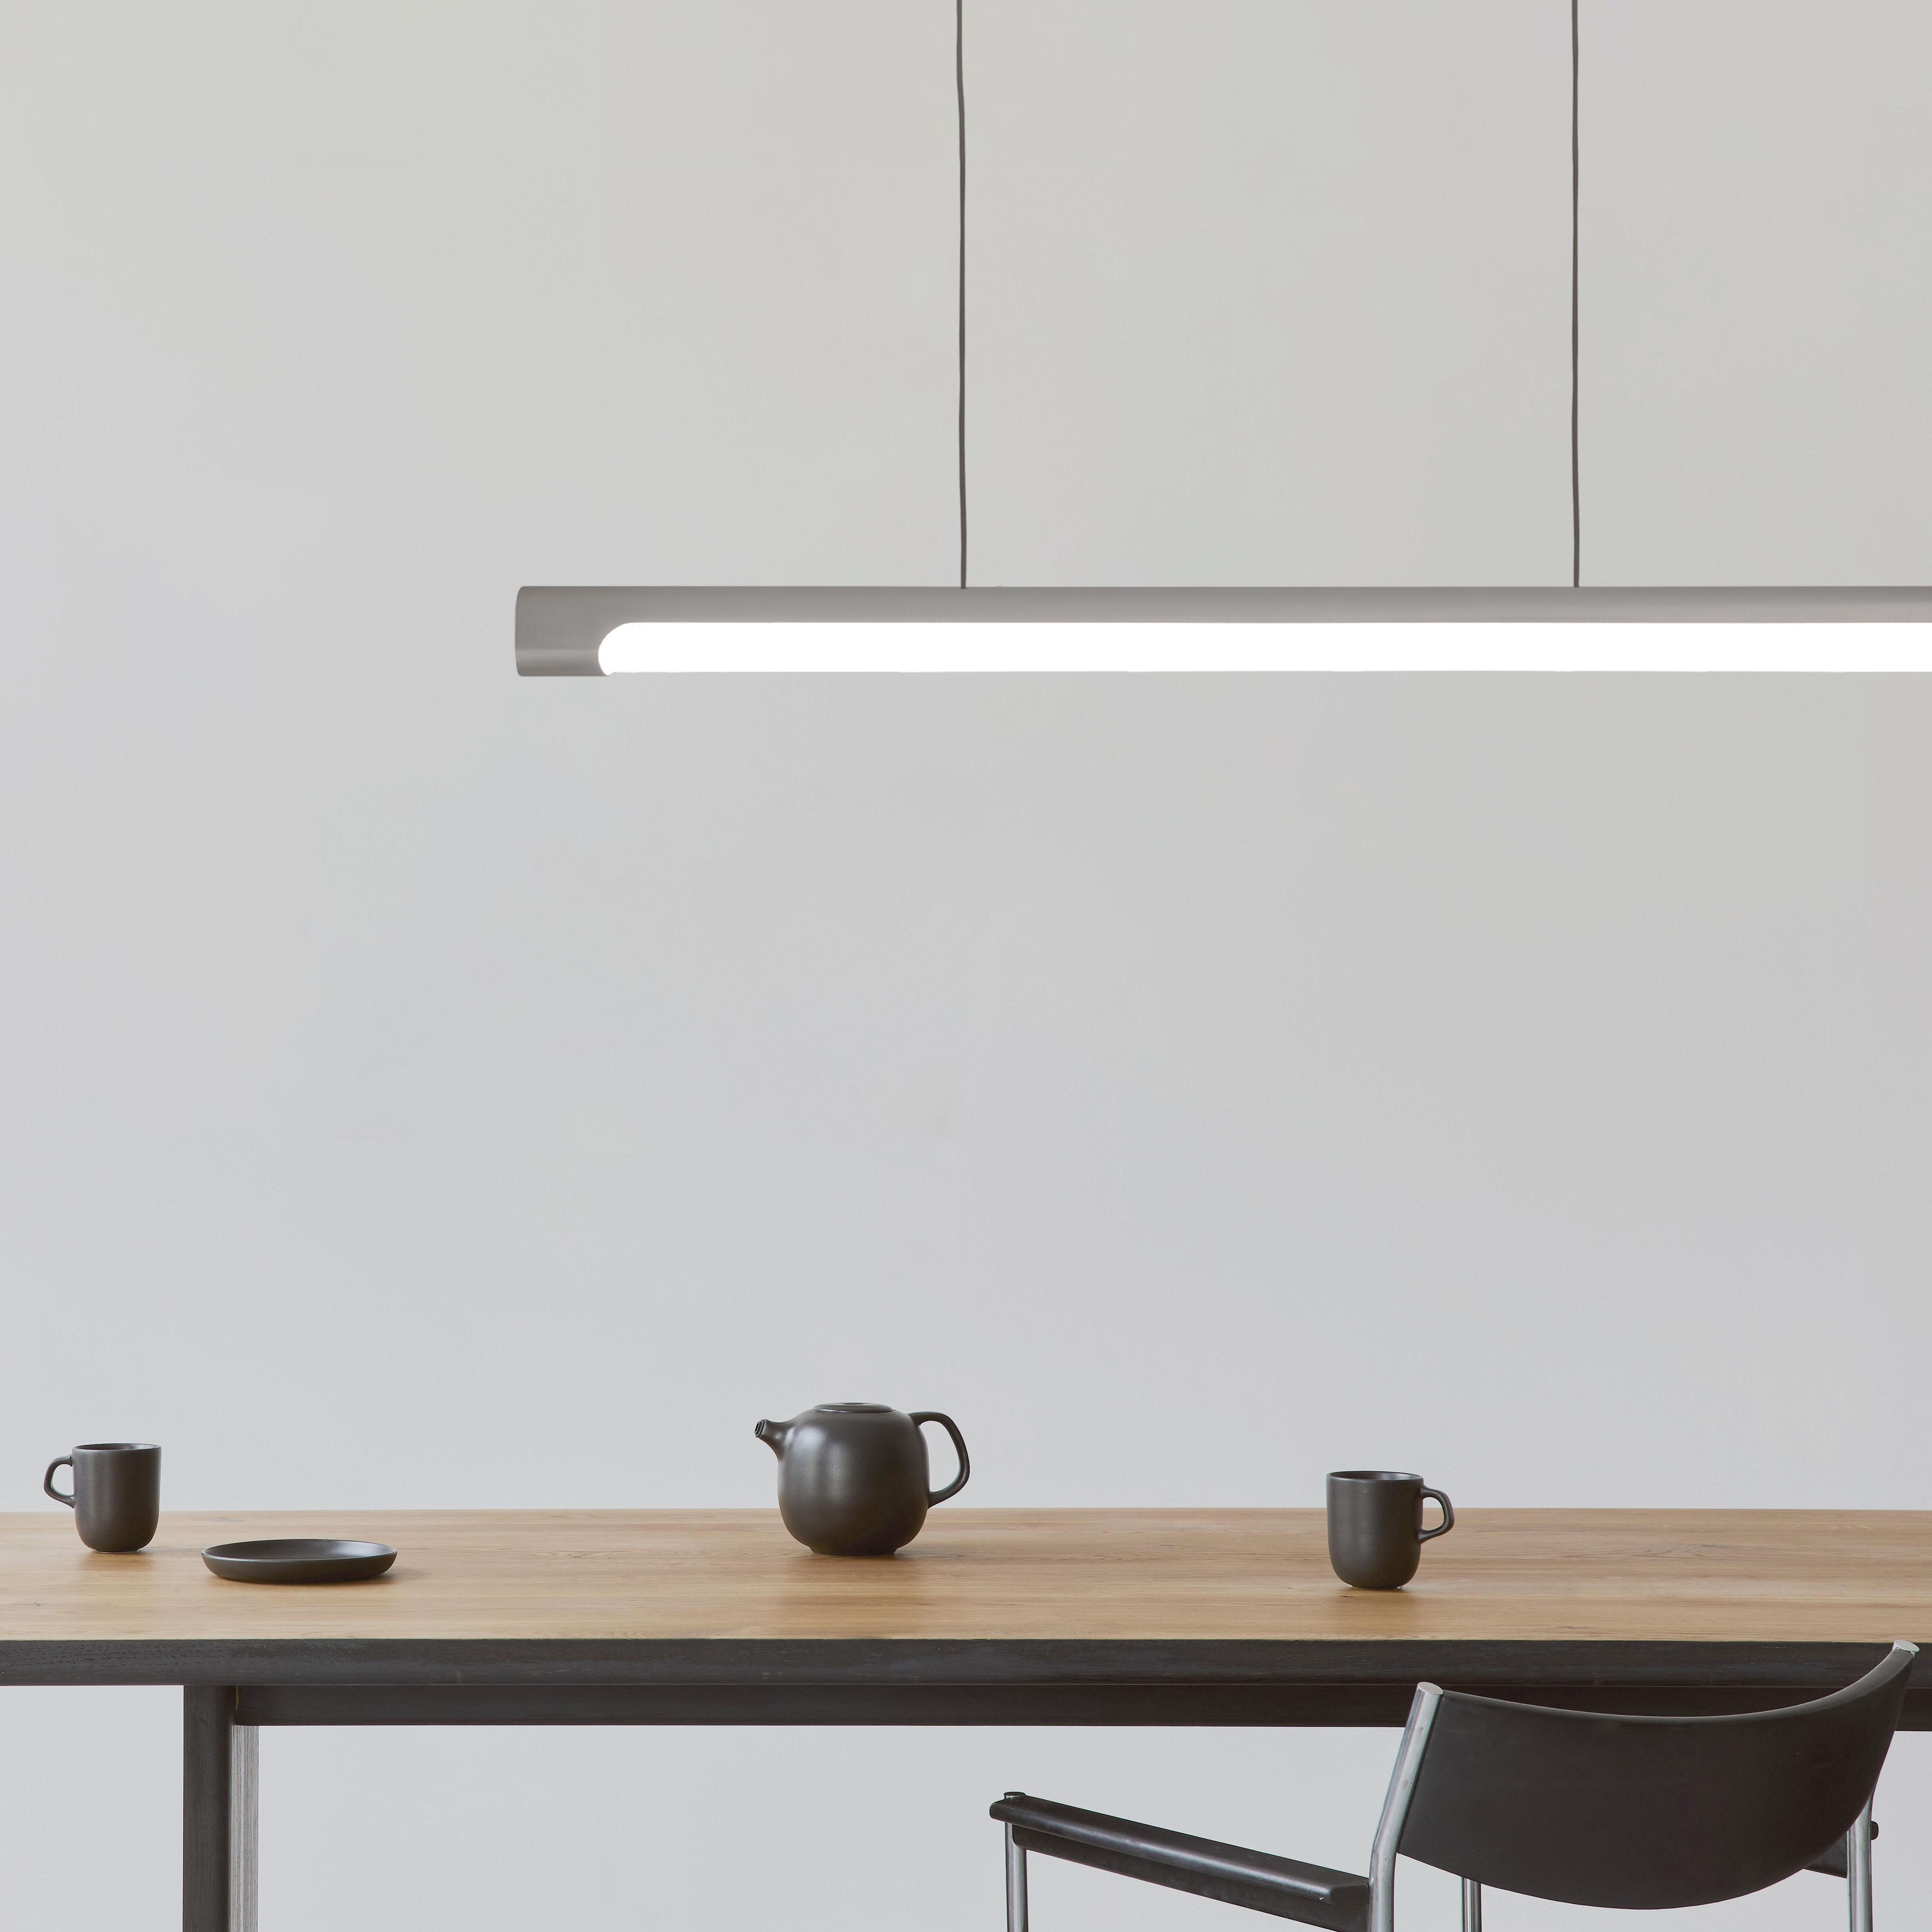 Nacelle linear LED pendant 48in length healthcare